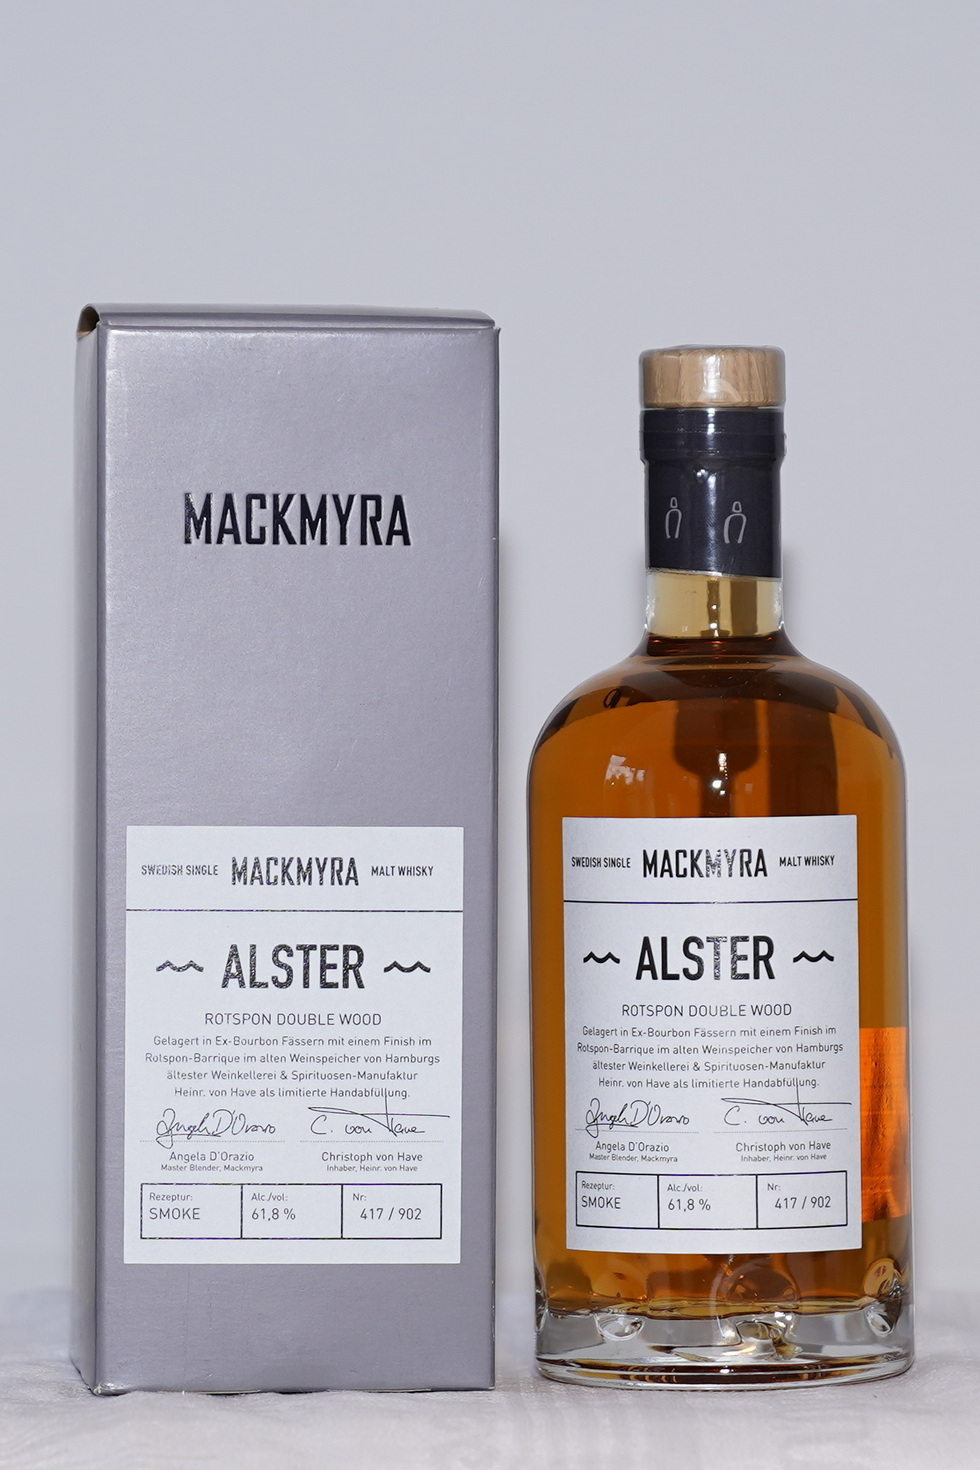 Mackmyra Alster- Rotspon Double Wood 61,8%